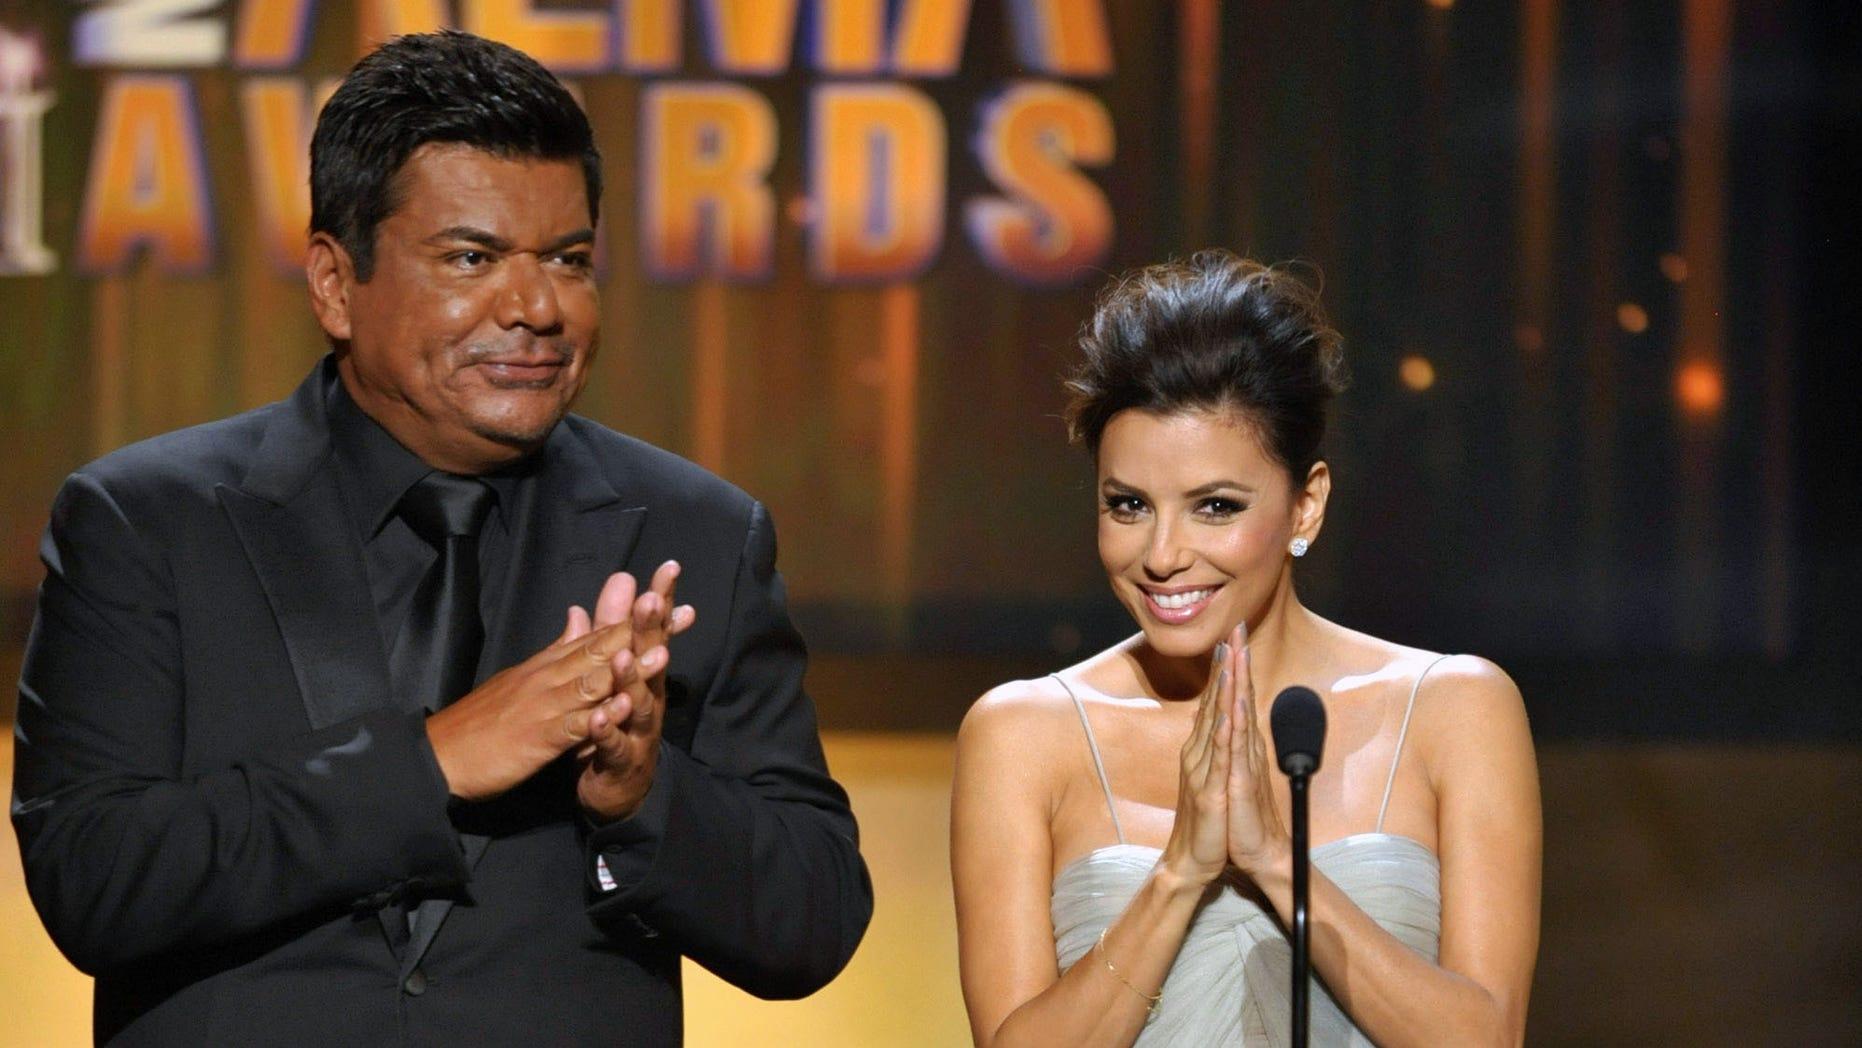 Sept. 16, 2012: Hosts George Lopez and Eva Longoria speak onstage at the ALMA Awards in Pasadena, Calif.